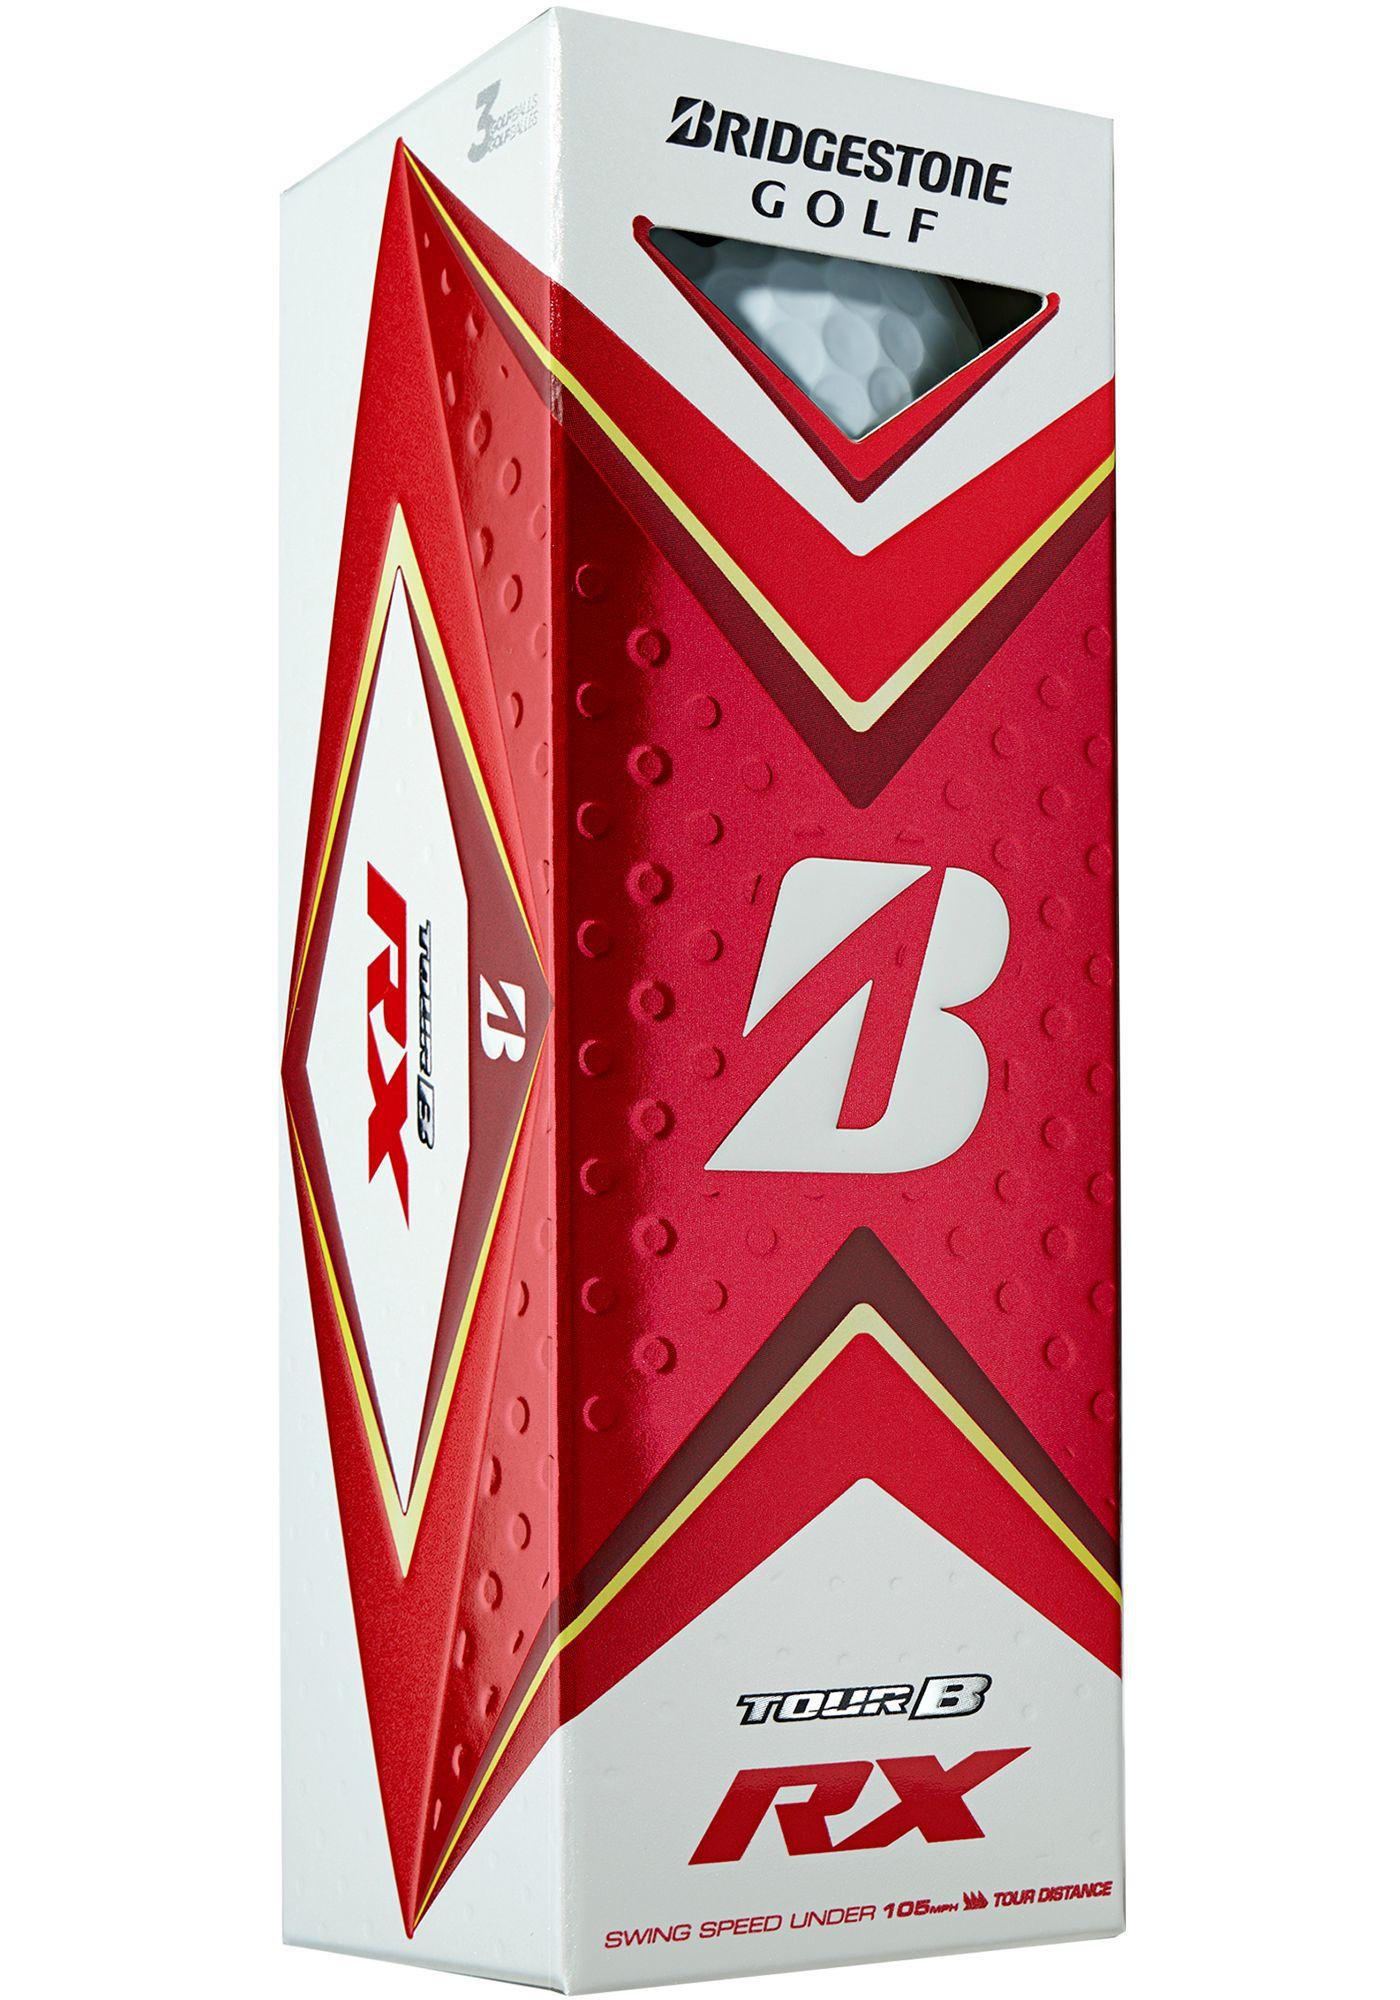 Bridgestone 2020 TOUR B RX Golf Balls – 3 Pack